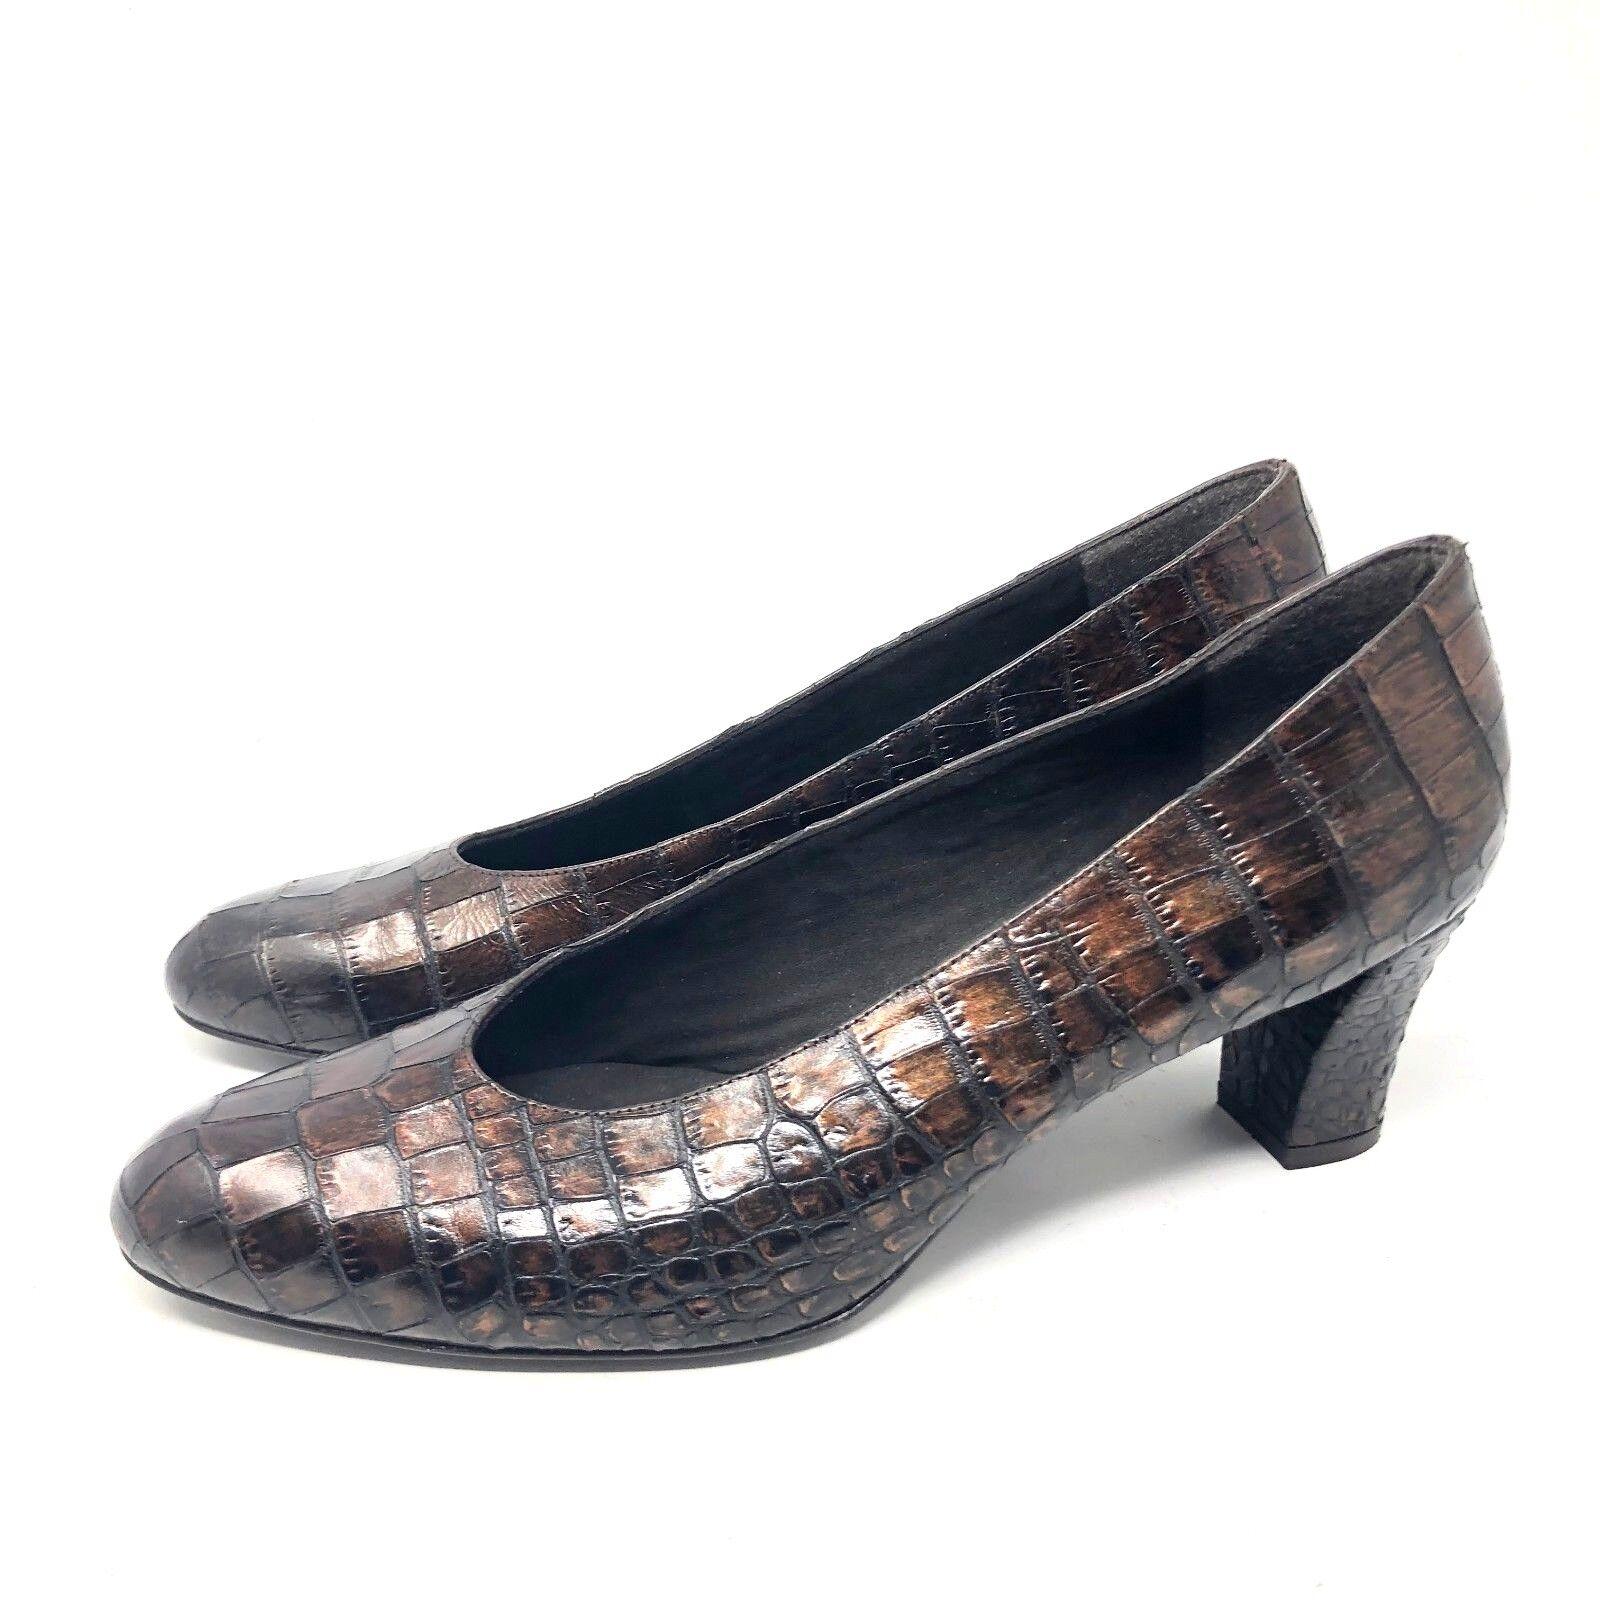 Stuart Weitzman Tilting Pump Braun Leder Leder Leder Croc Embossed Damenschuhe Schuhe SIZE 10 M dd337a